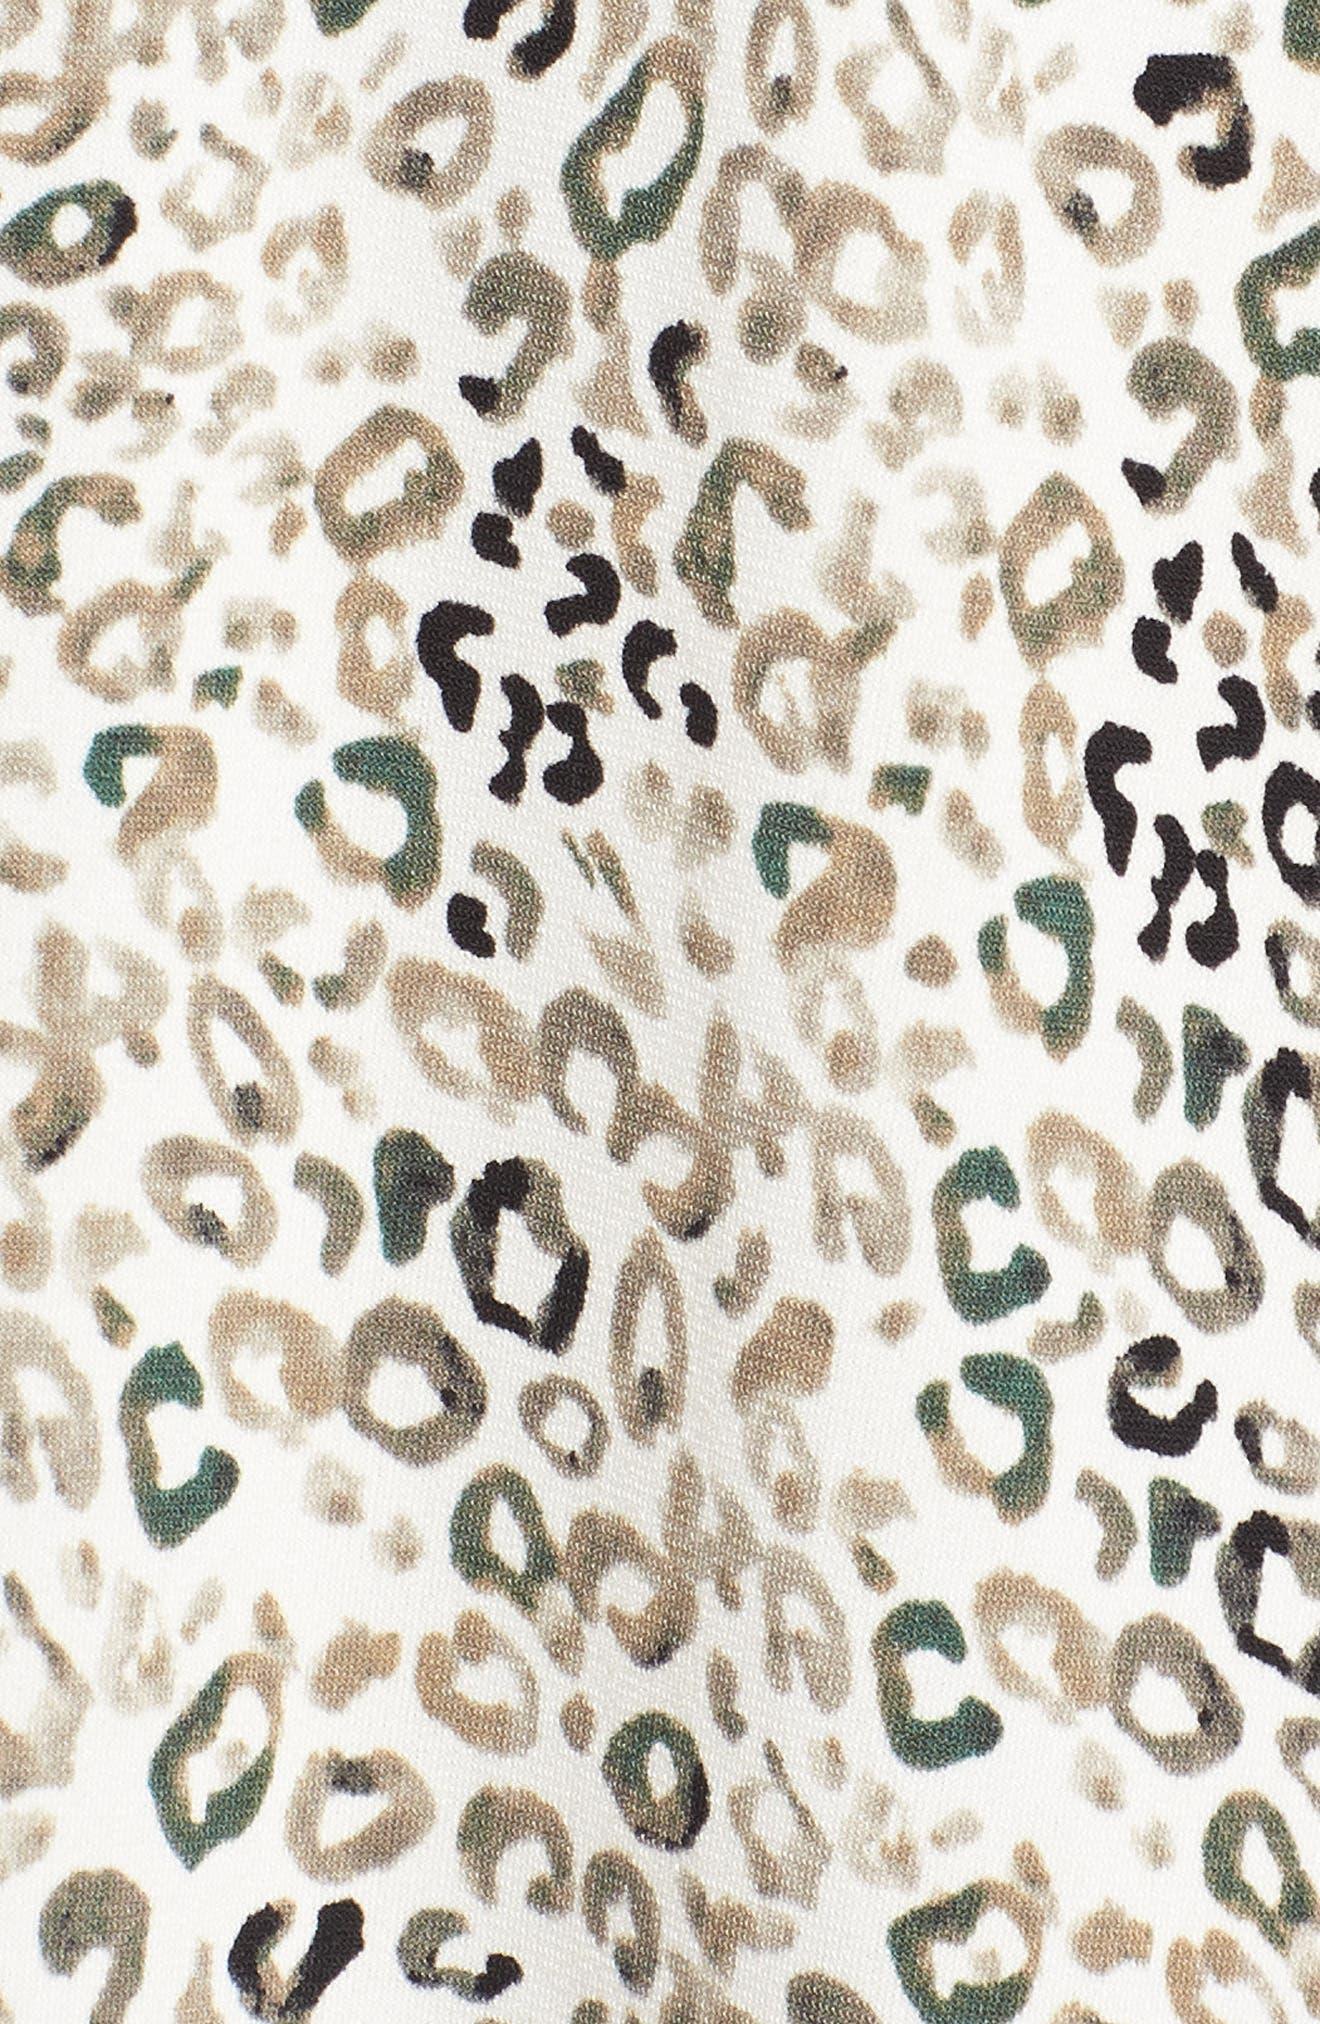 Leopard Print Maxi Dress,                             Alternate thumbnail 5, color,                             103-New Ivory